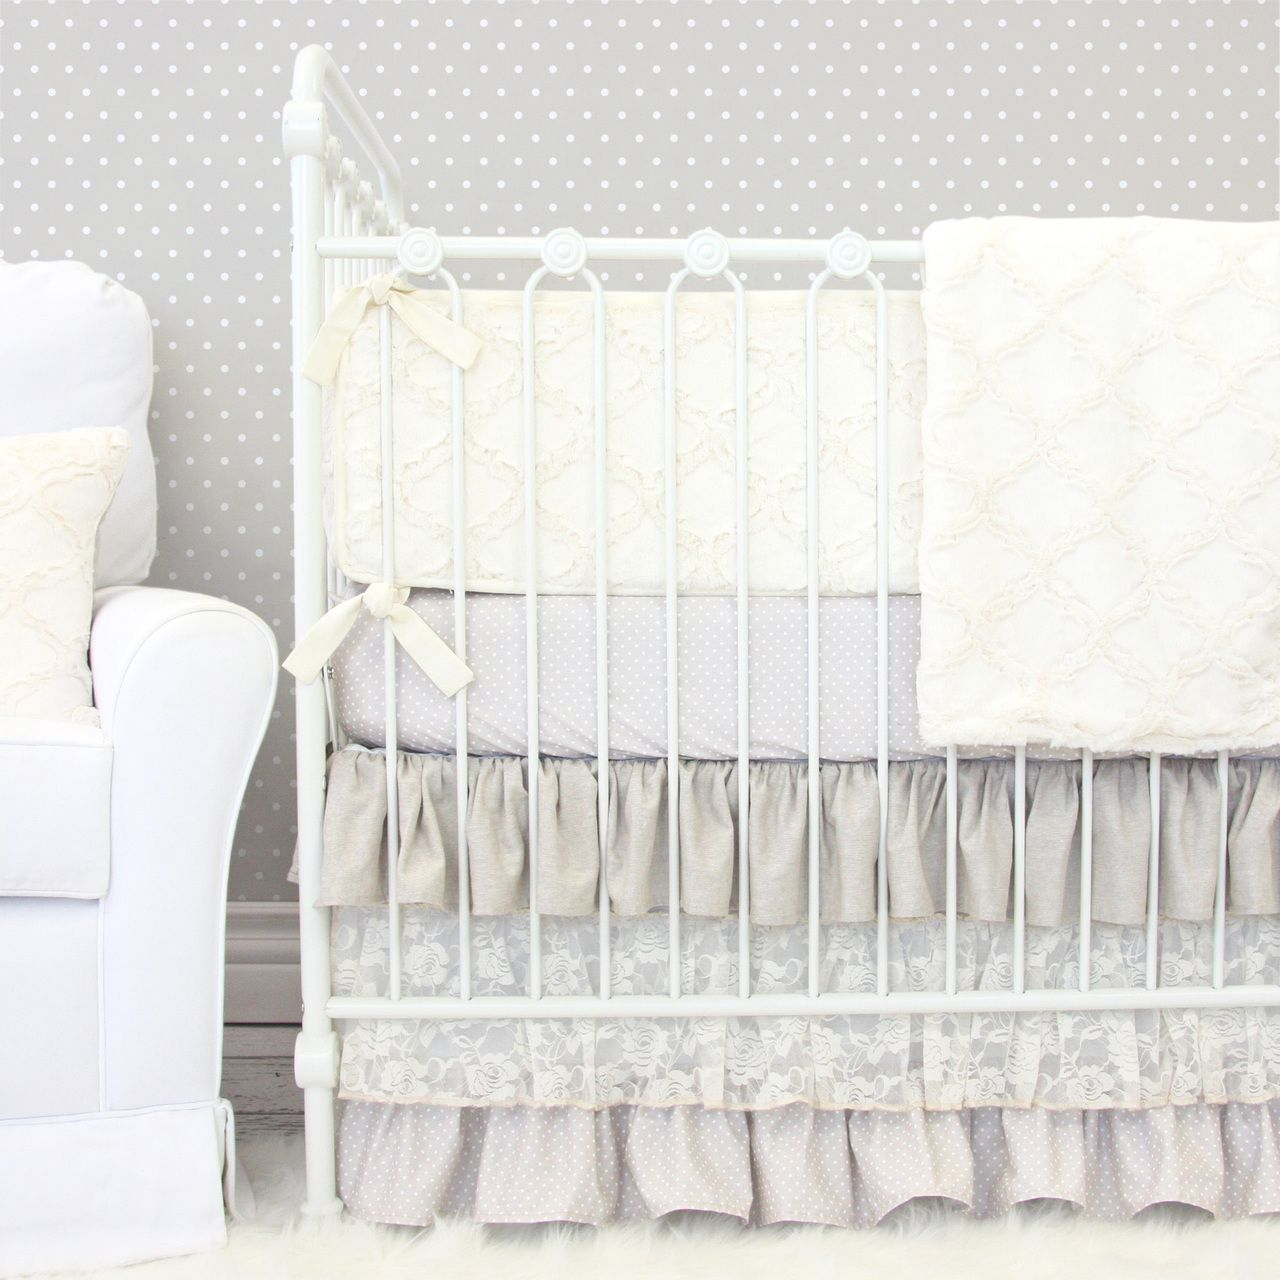 A neutral tone crib bedding that can look elegant